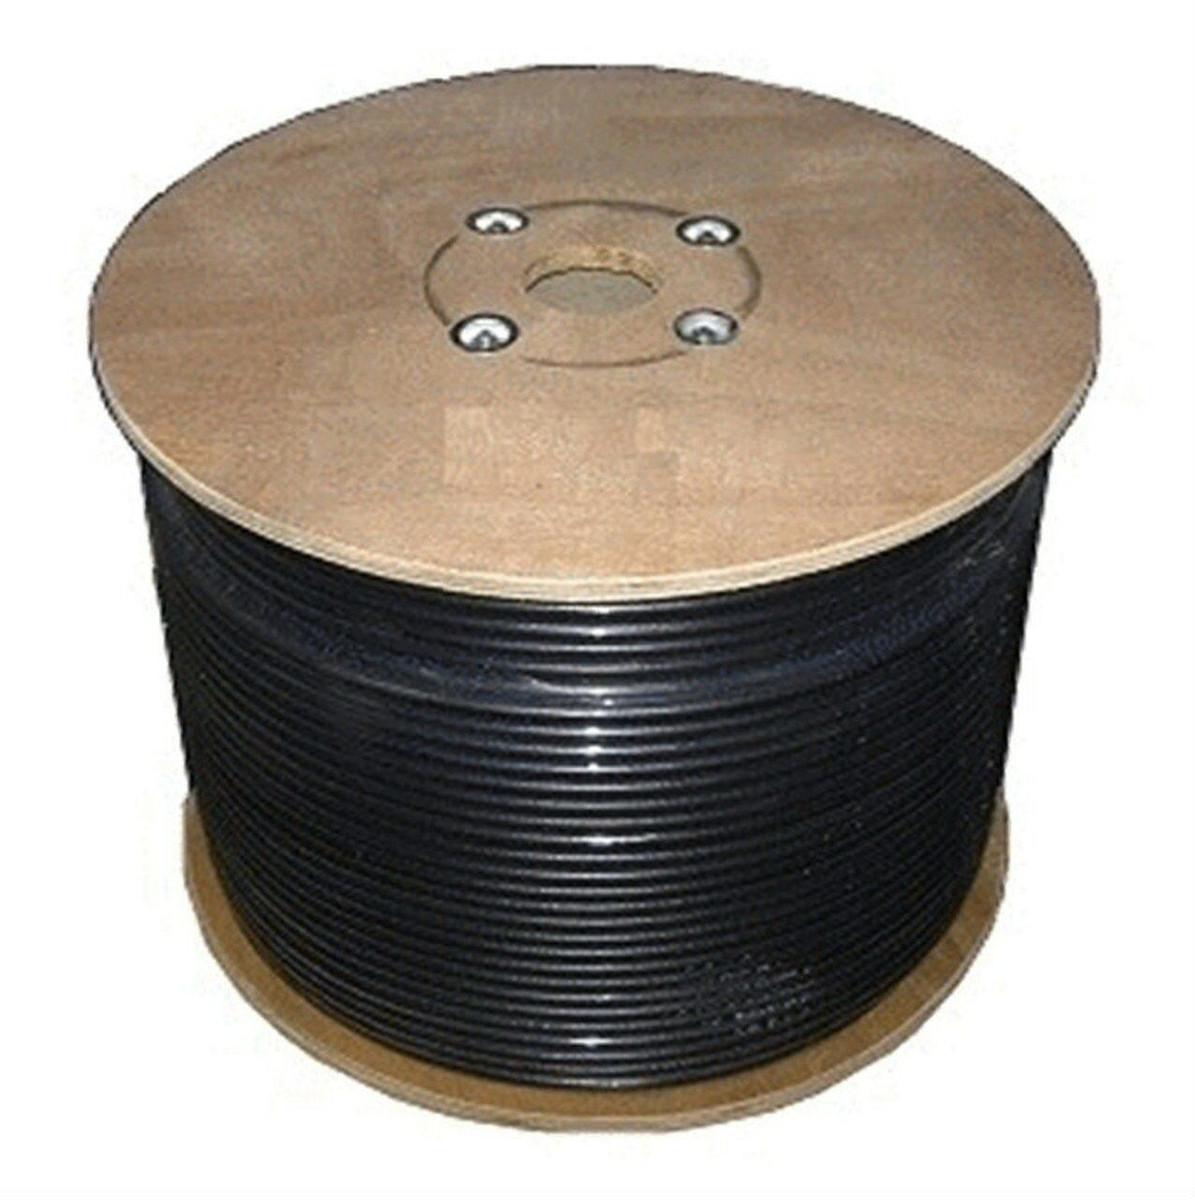 Bolton Tech Bolton Technical Bolton600 Ultra Low-Loss Coax Cable or Priced Per Foot